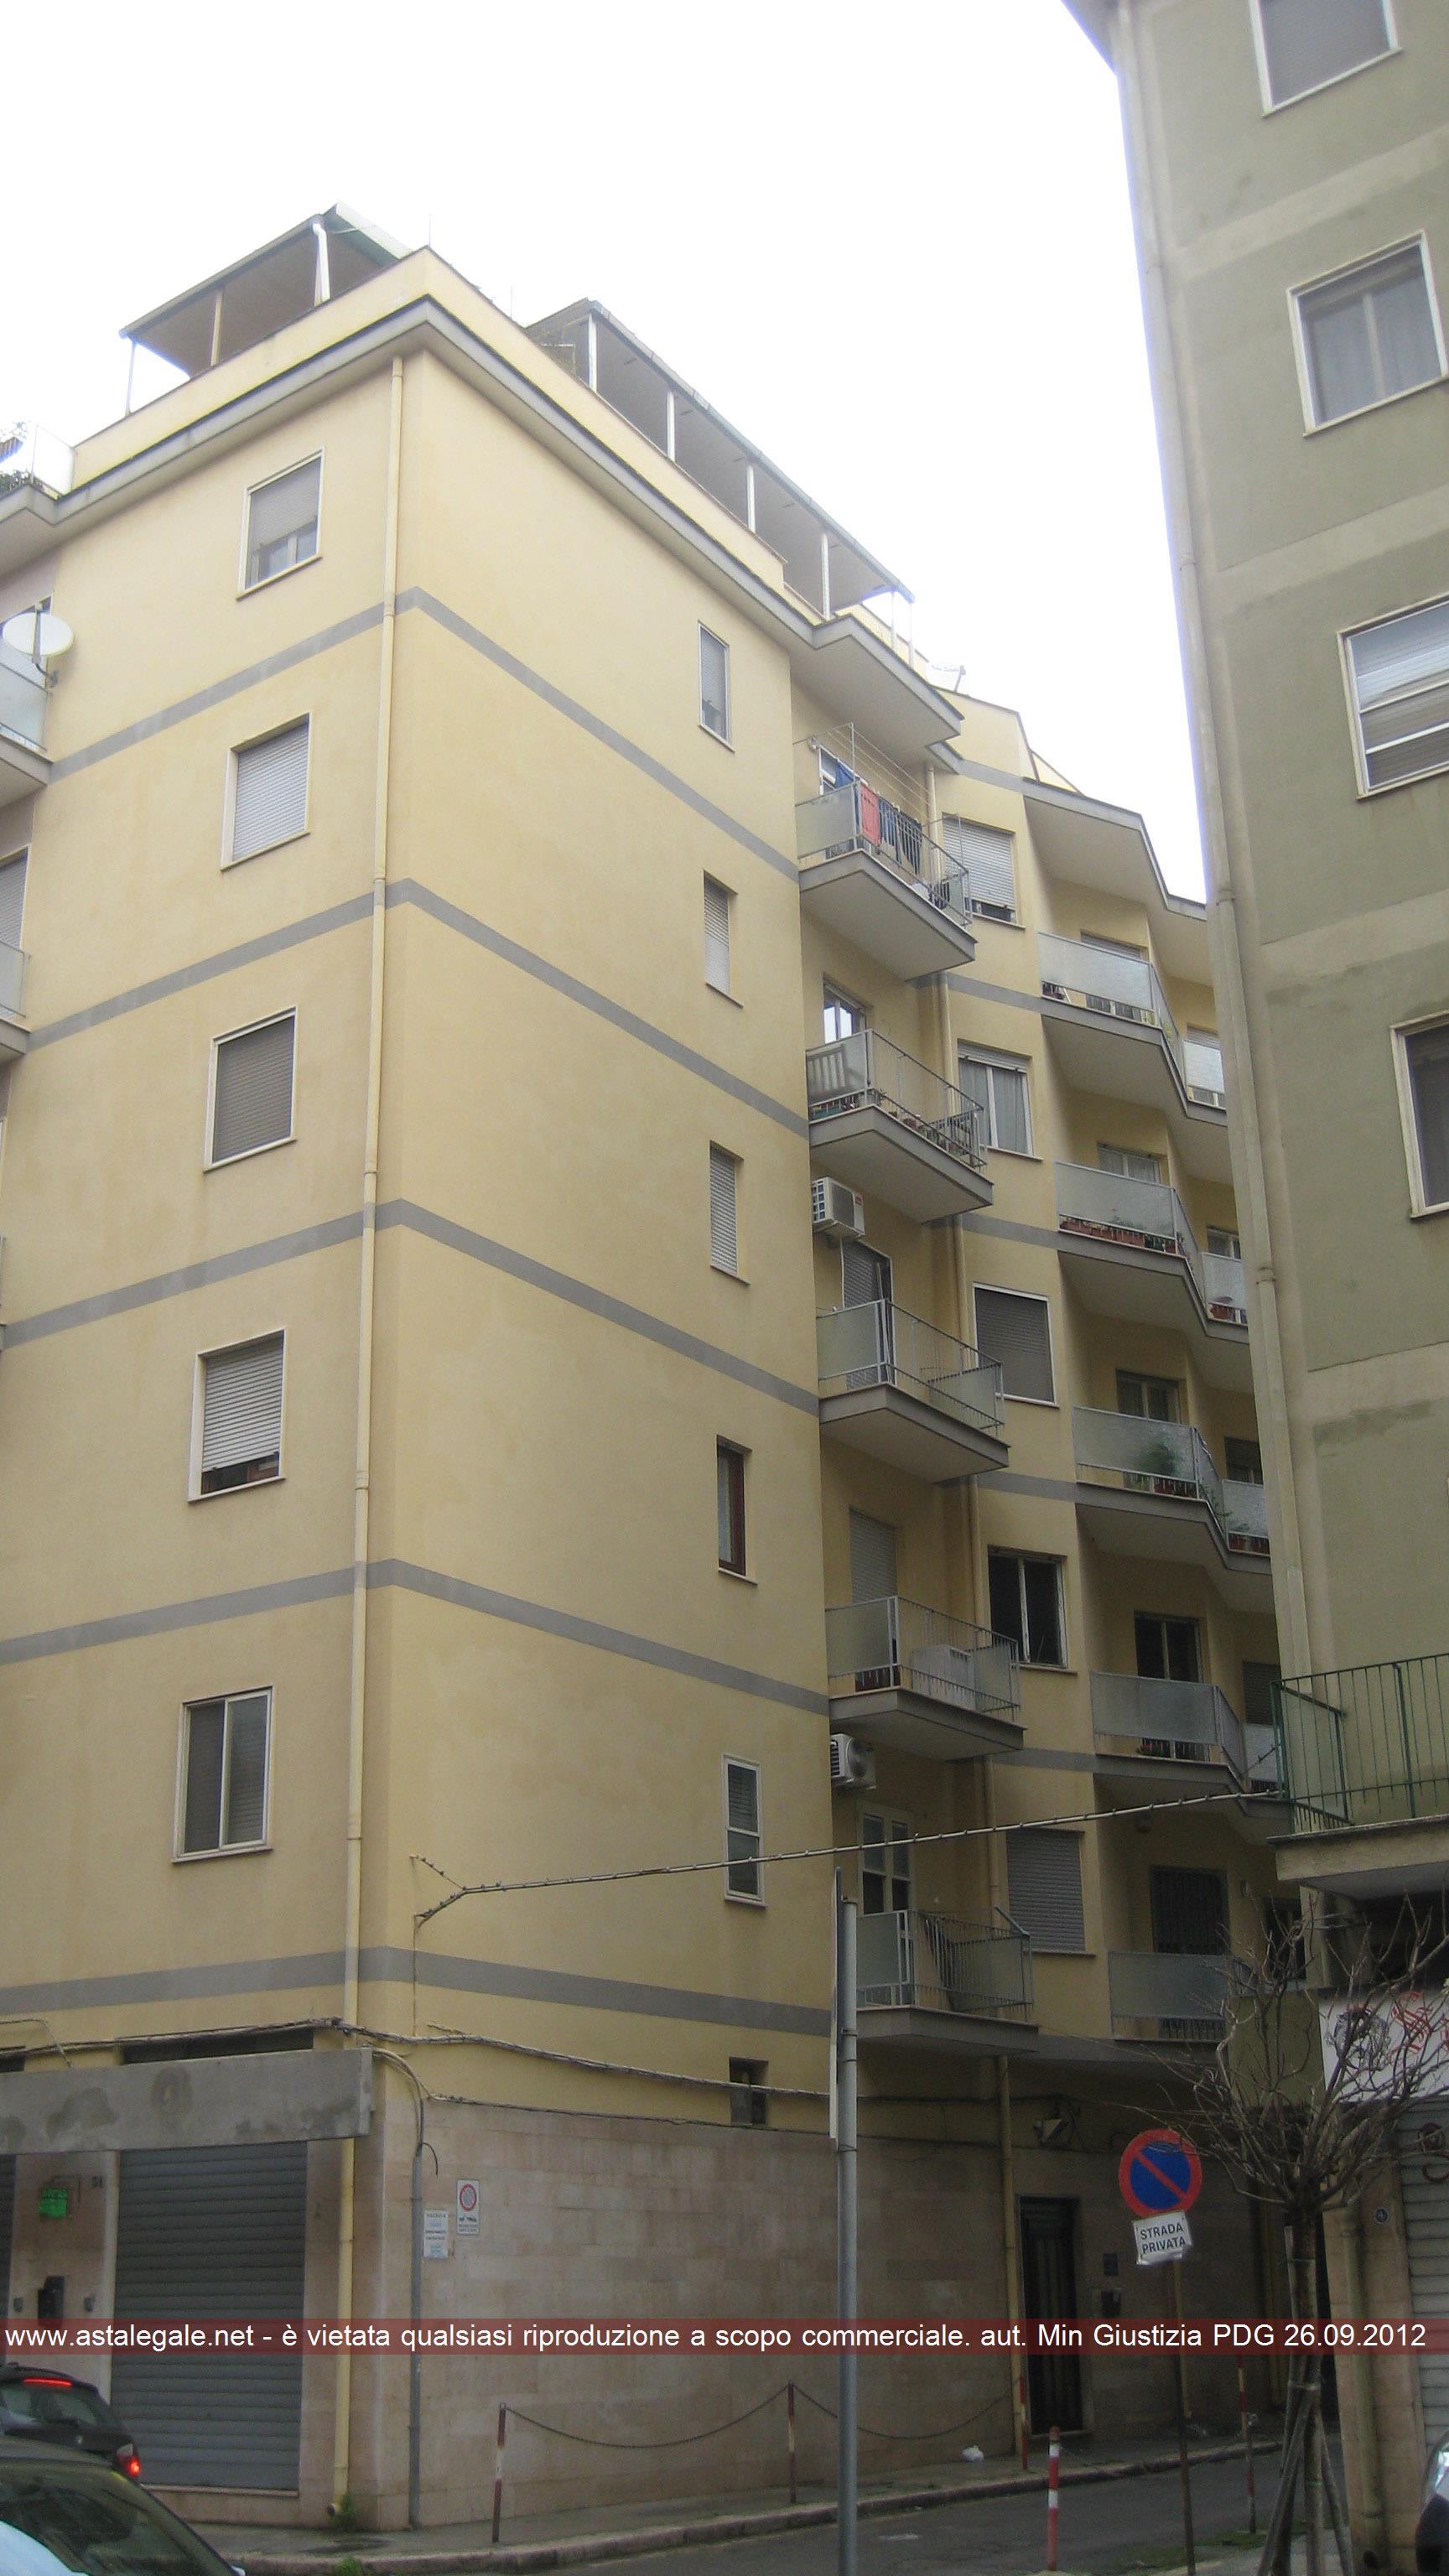 Brindisi (BR) Via Martiri delle Fosse Ardeatine  33